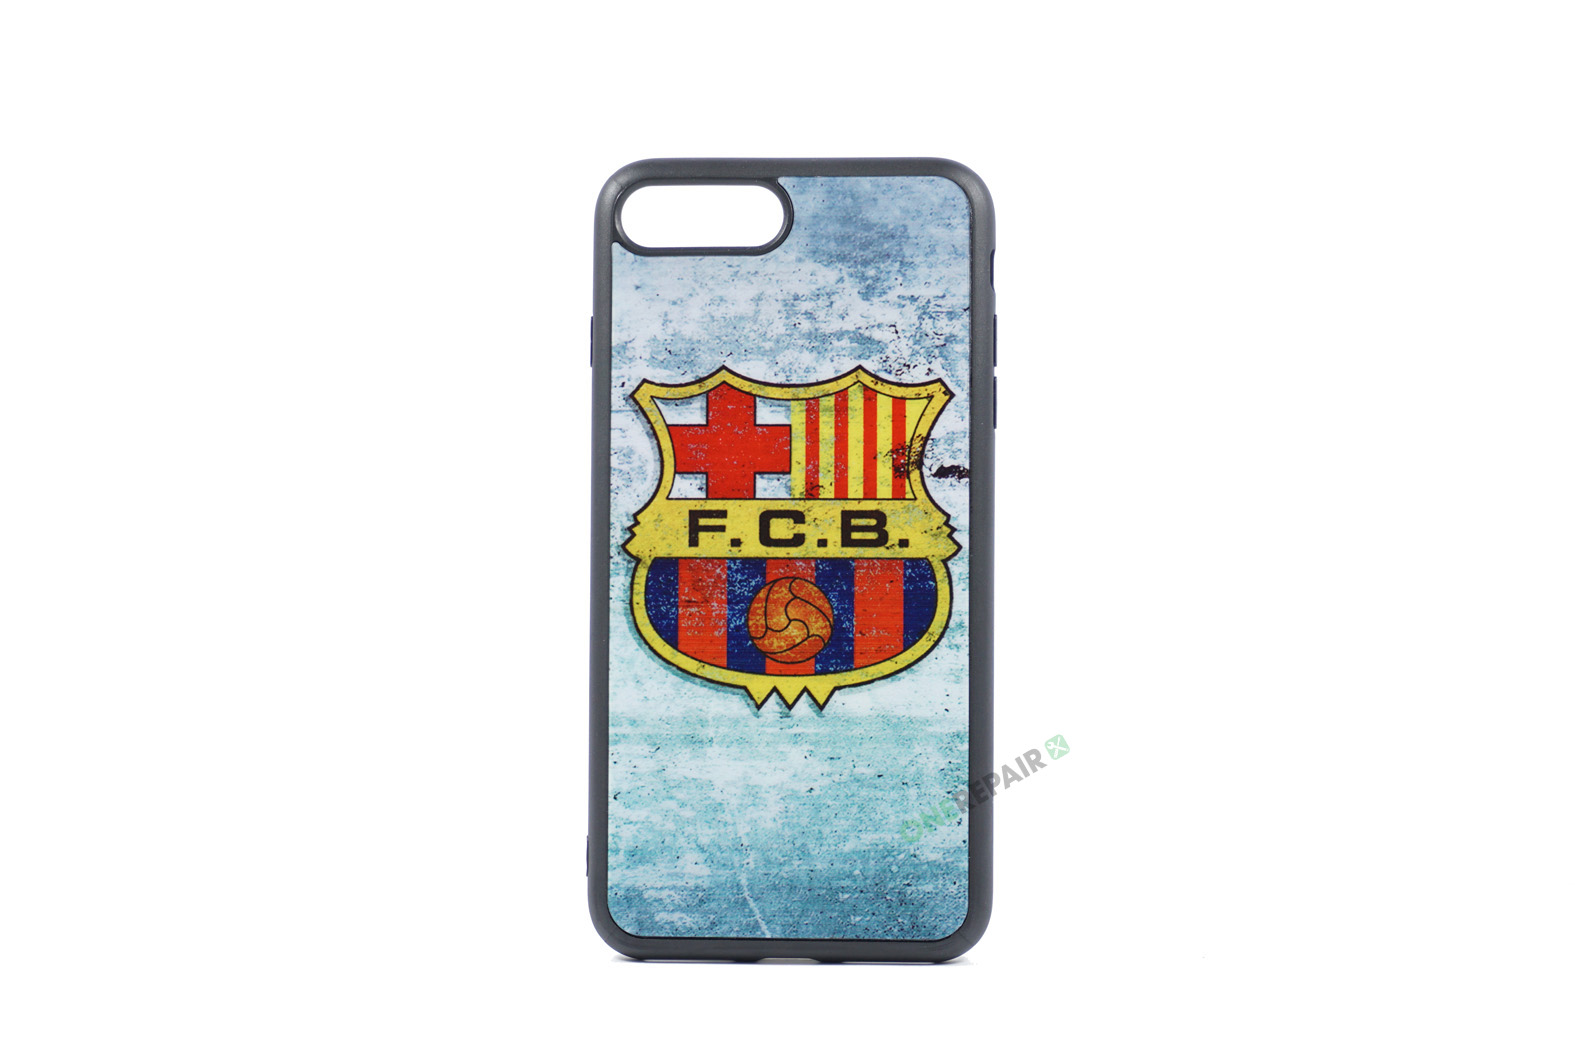 Barcelona FC, Fodbold cover iphone 7+ 8 +, 7 plus, 8 plus